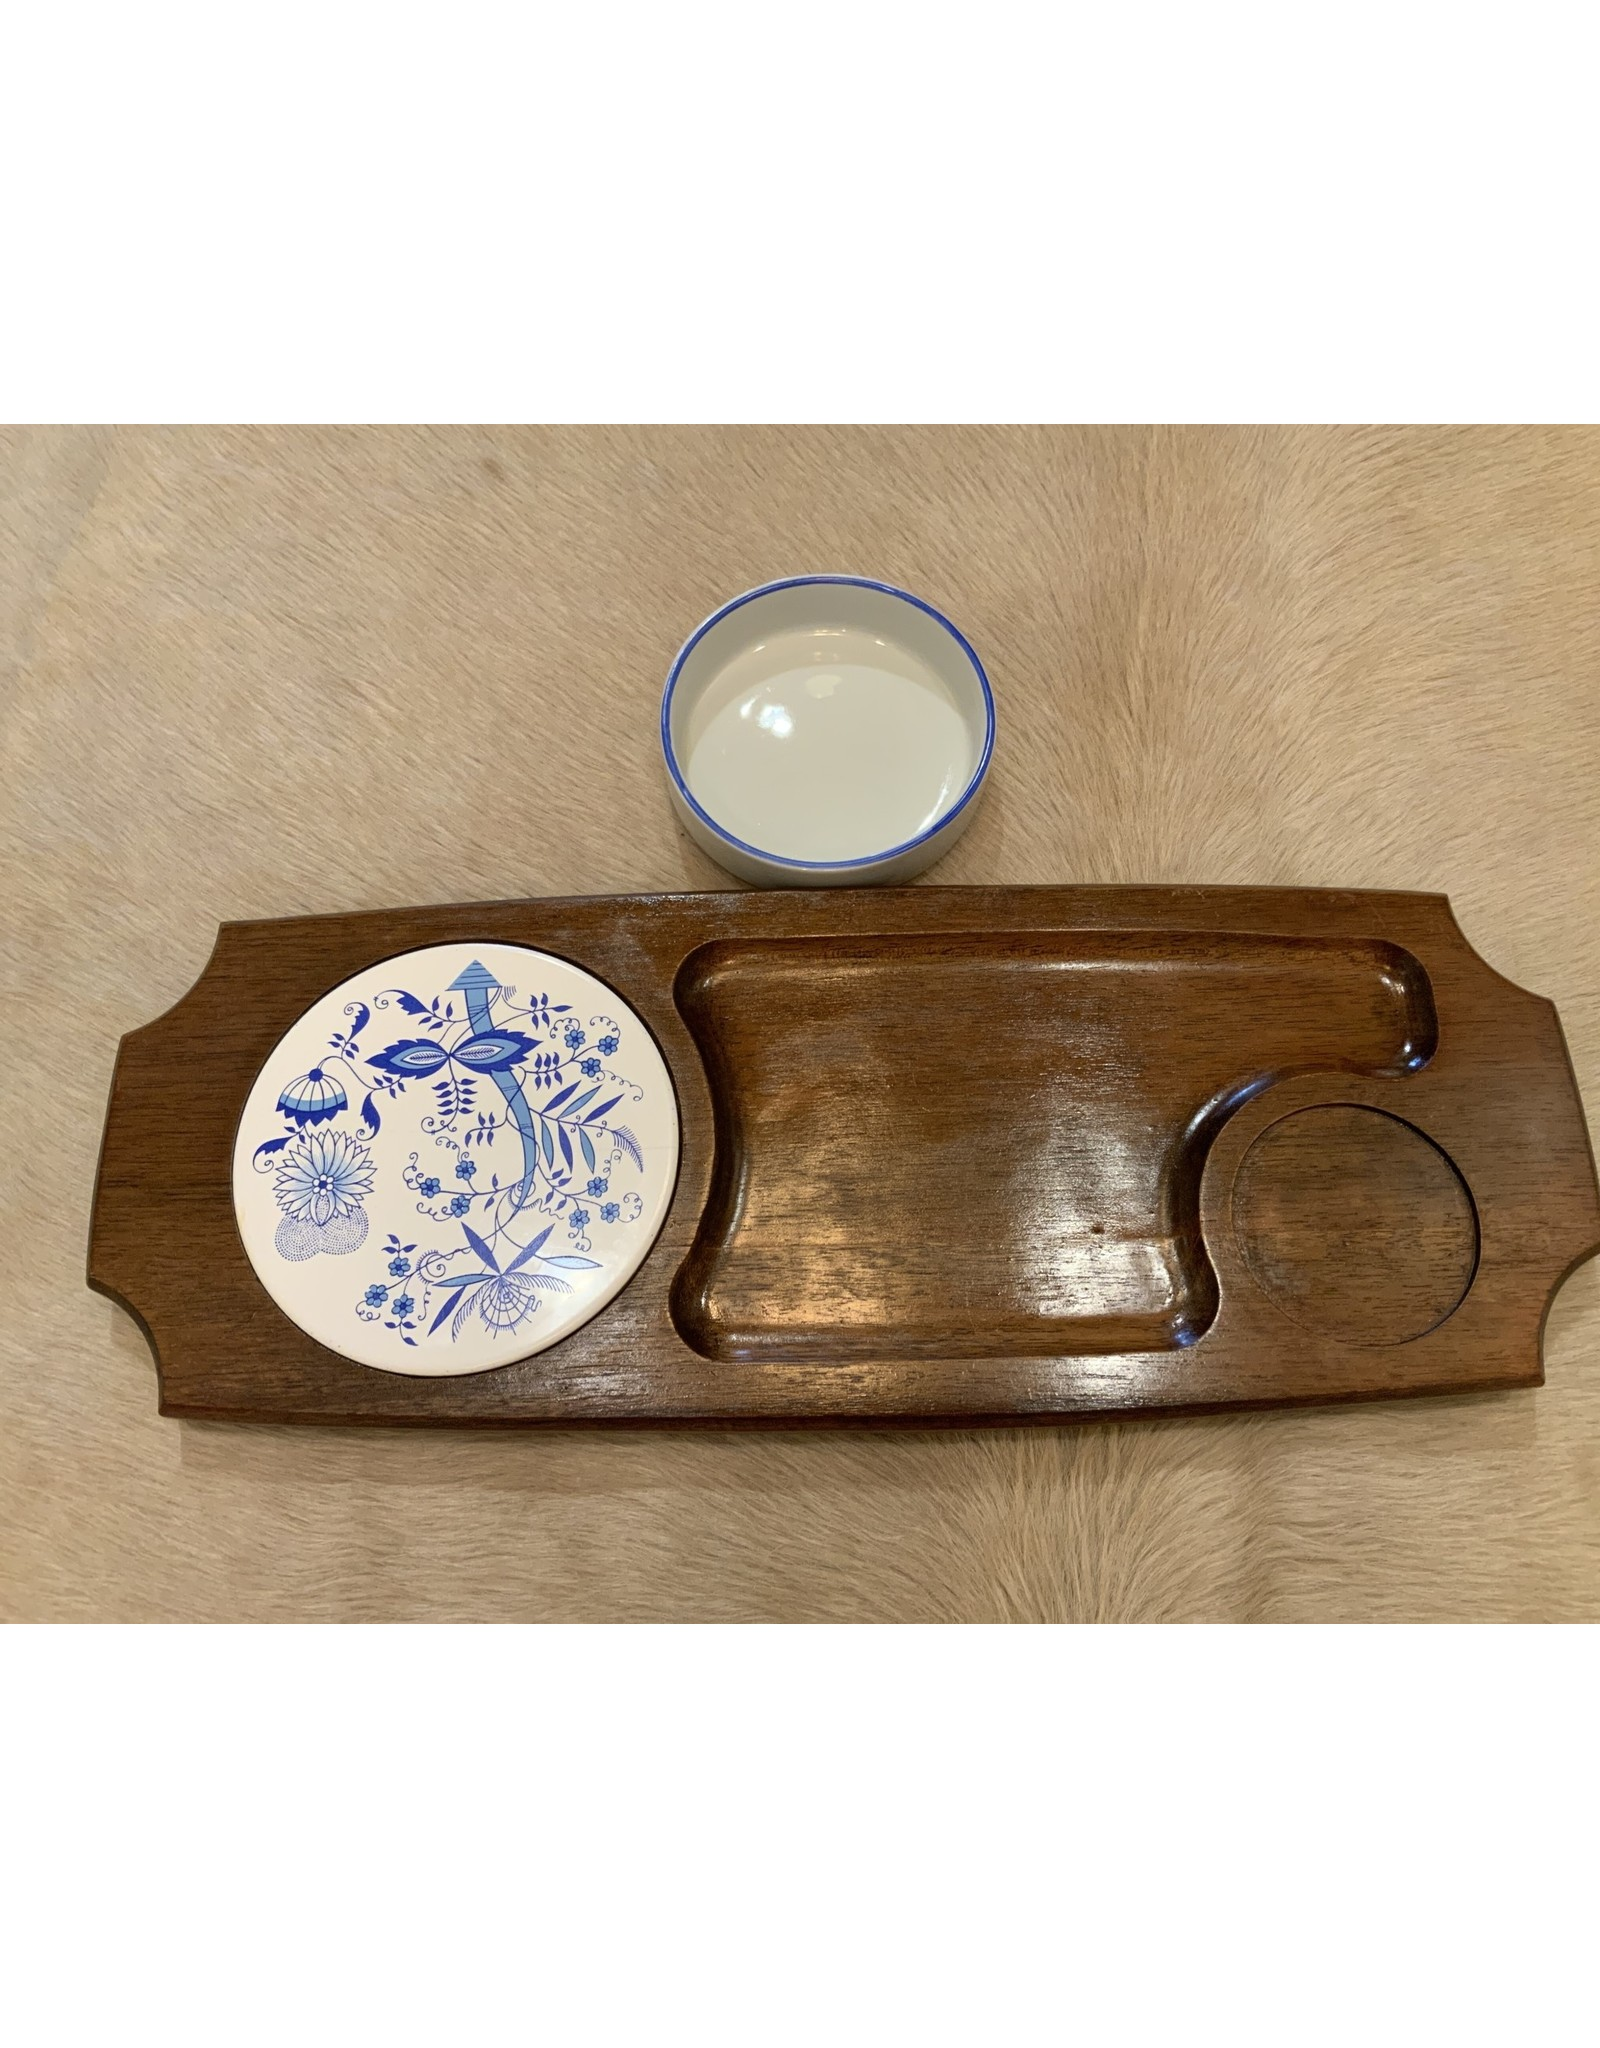 SPV Retro Wood Cheese Serving Tray